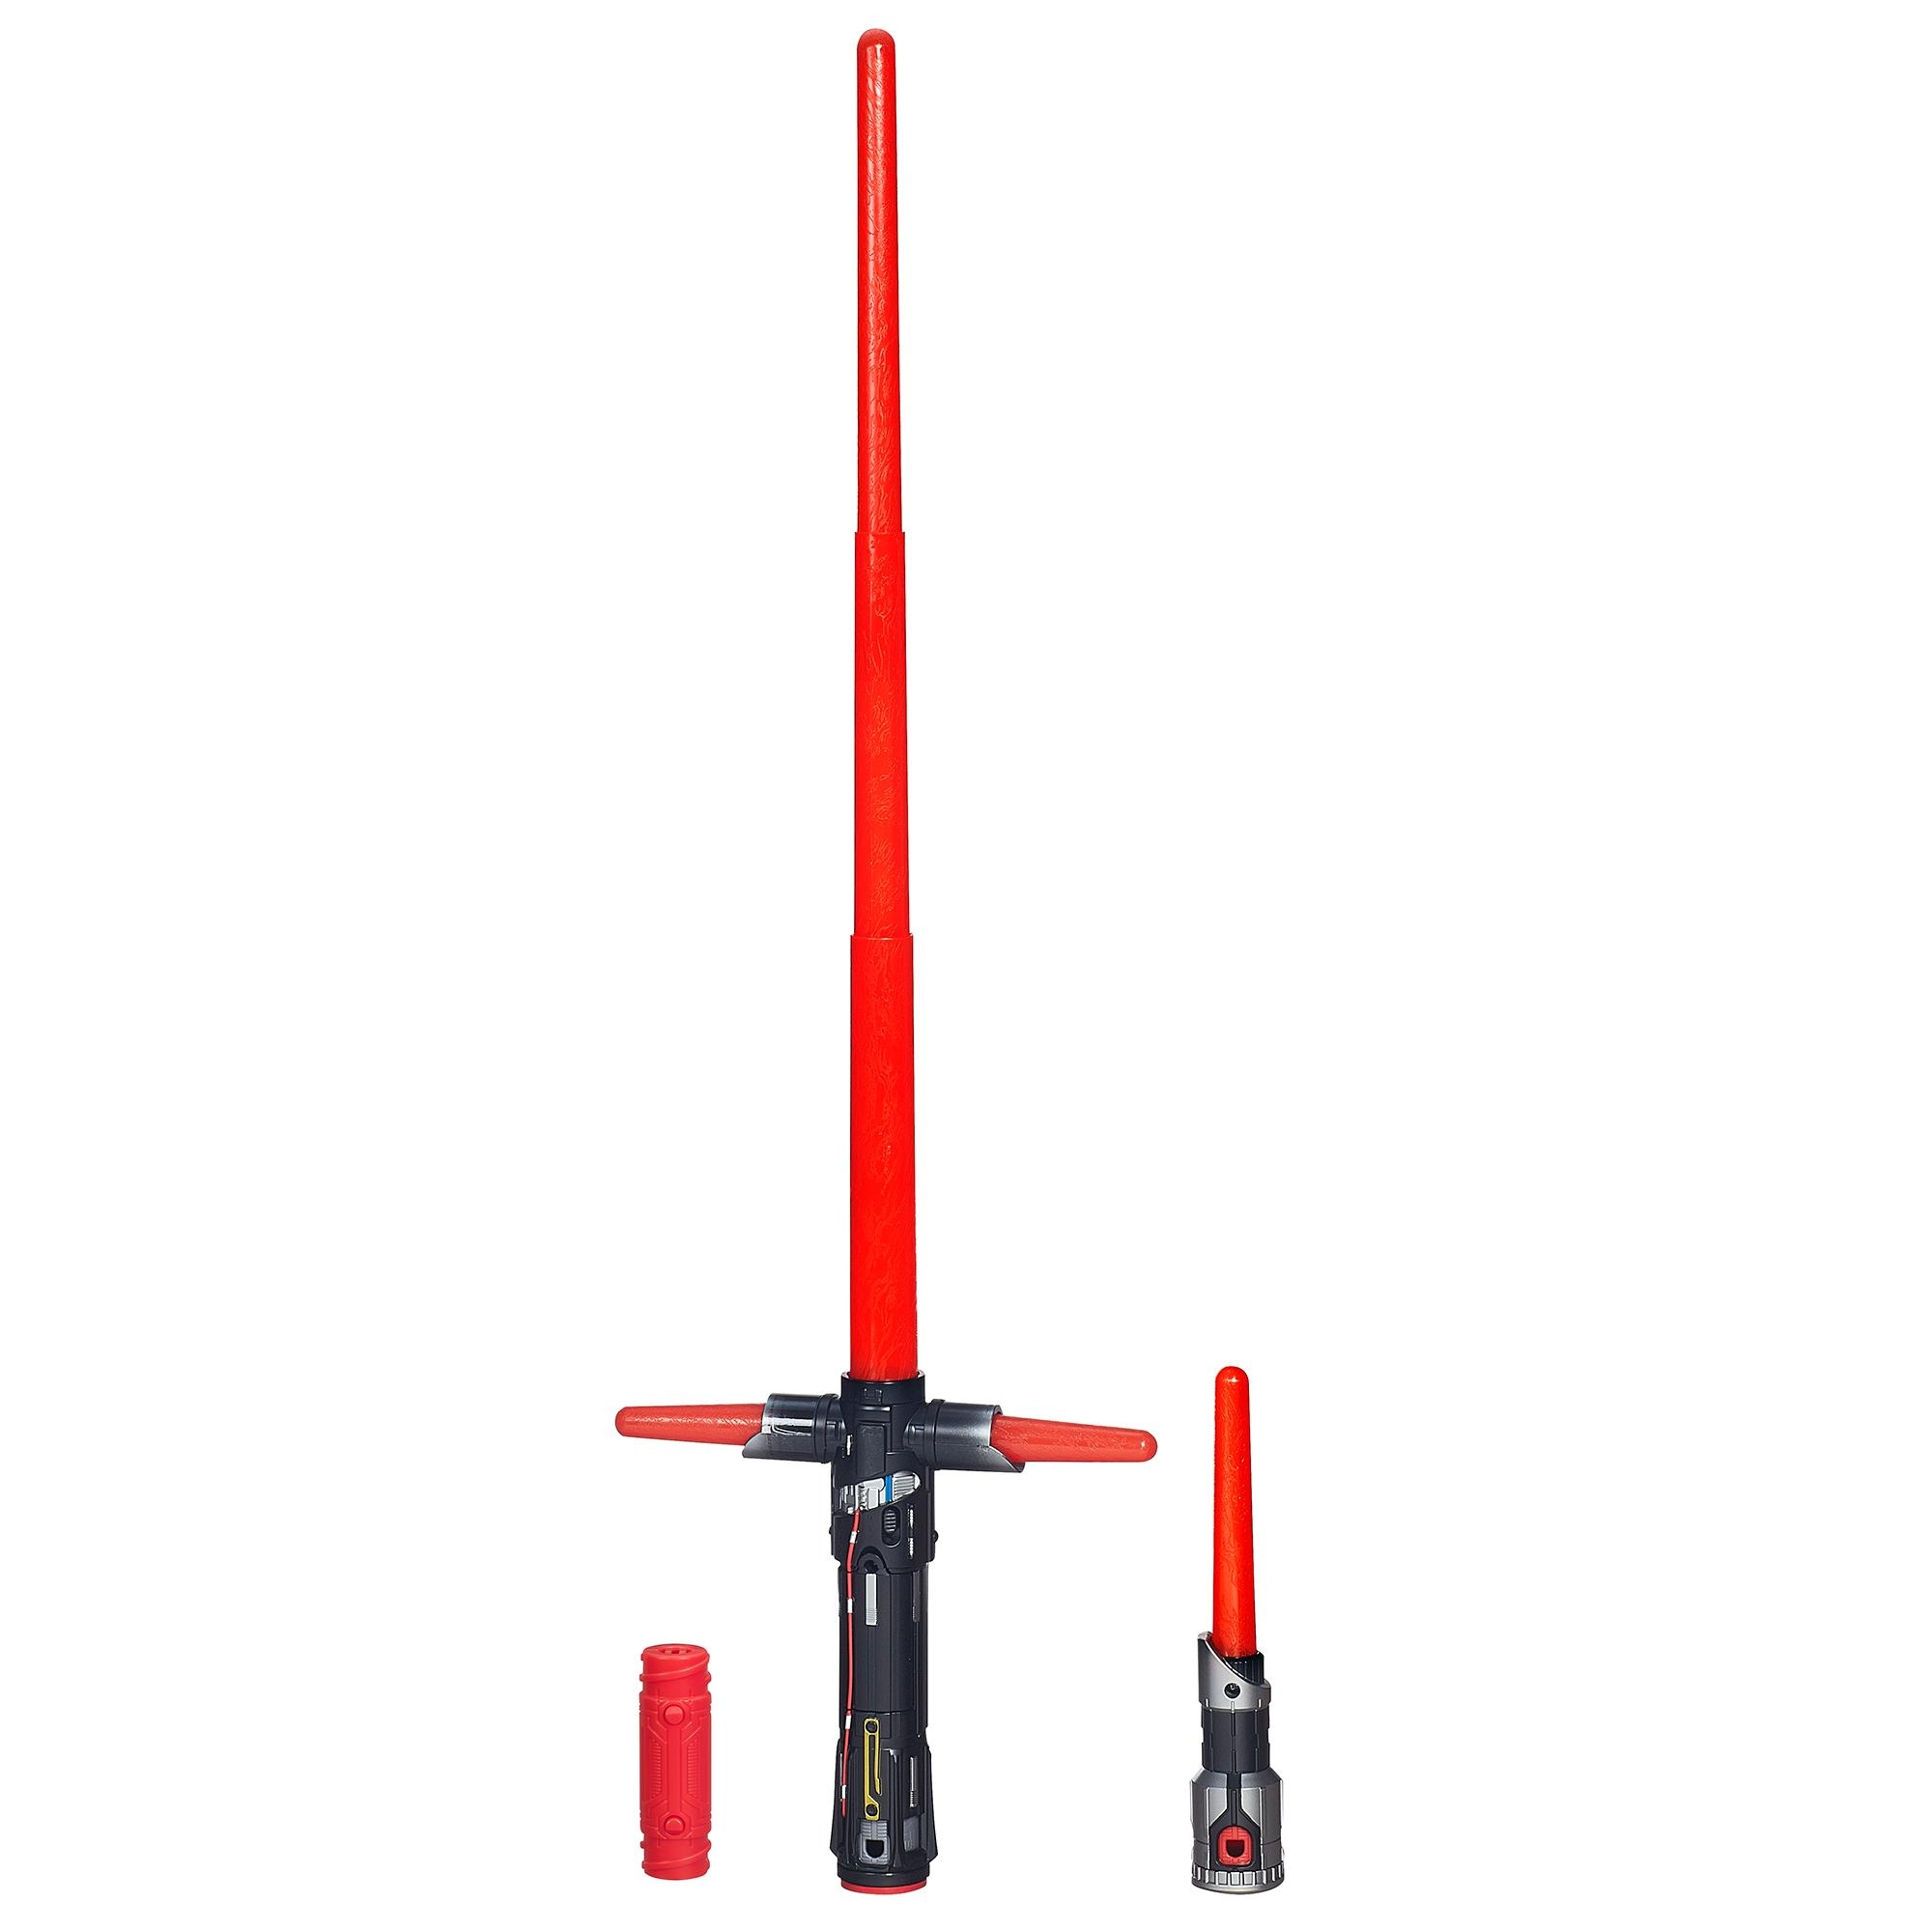 Star-Wars-The-Force-Awakens-Kylo-Ren-Deluxe-Electronic-Lightsaber